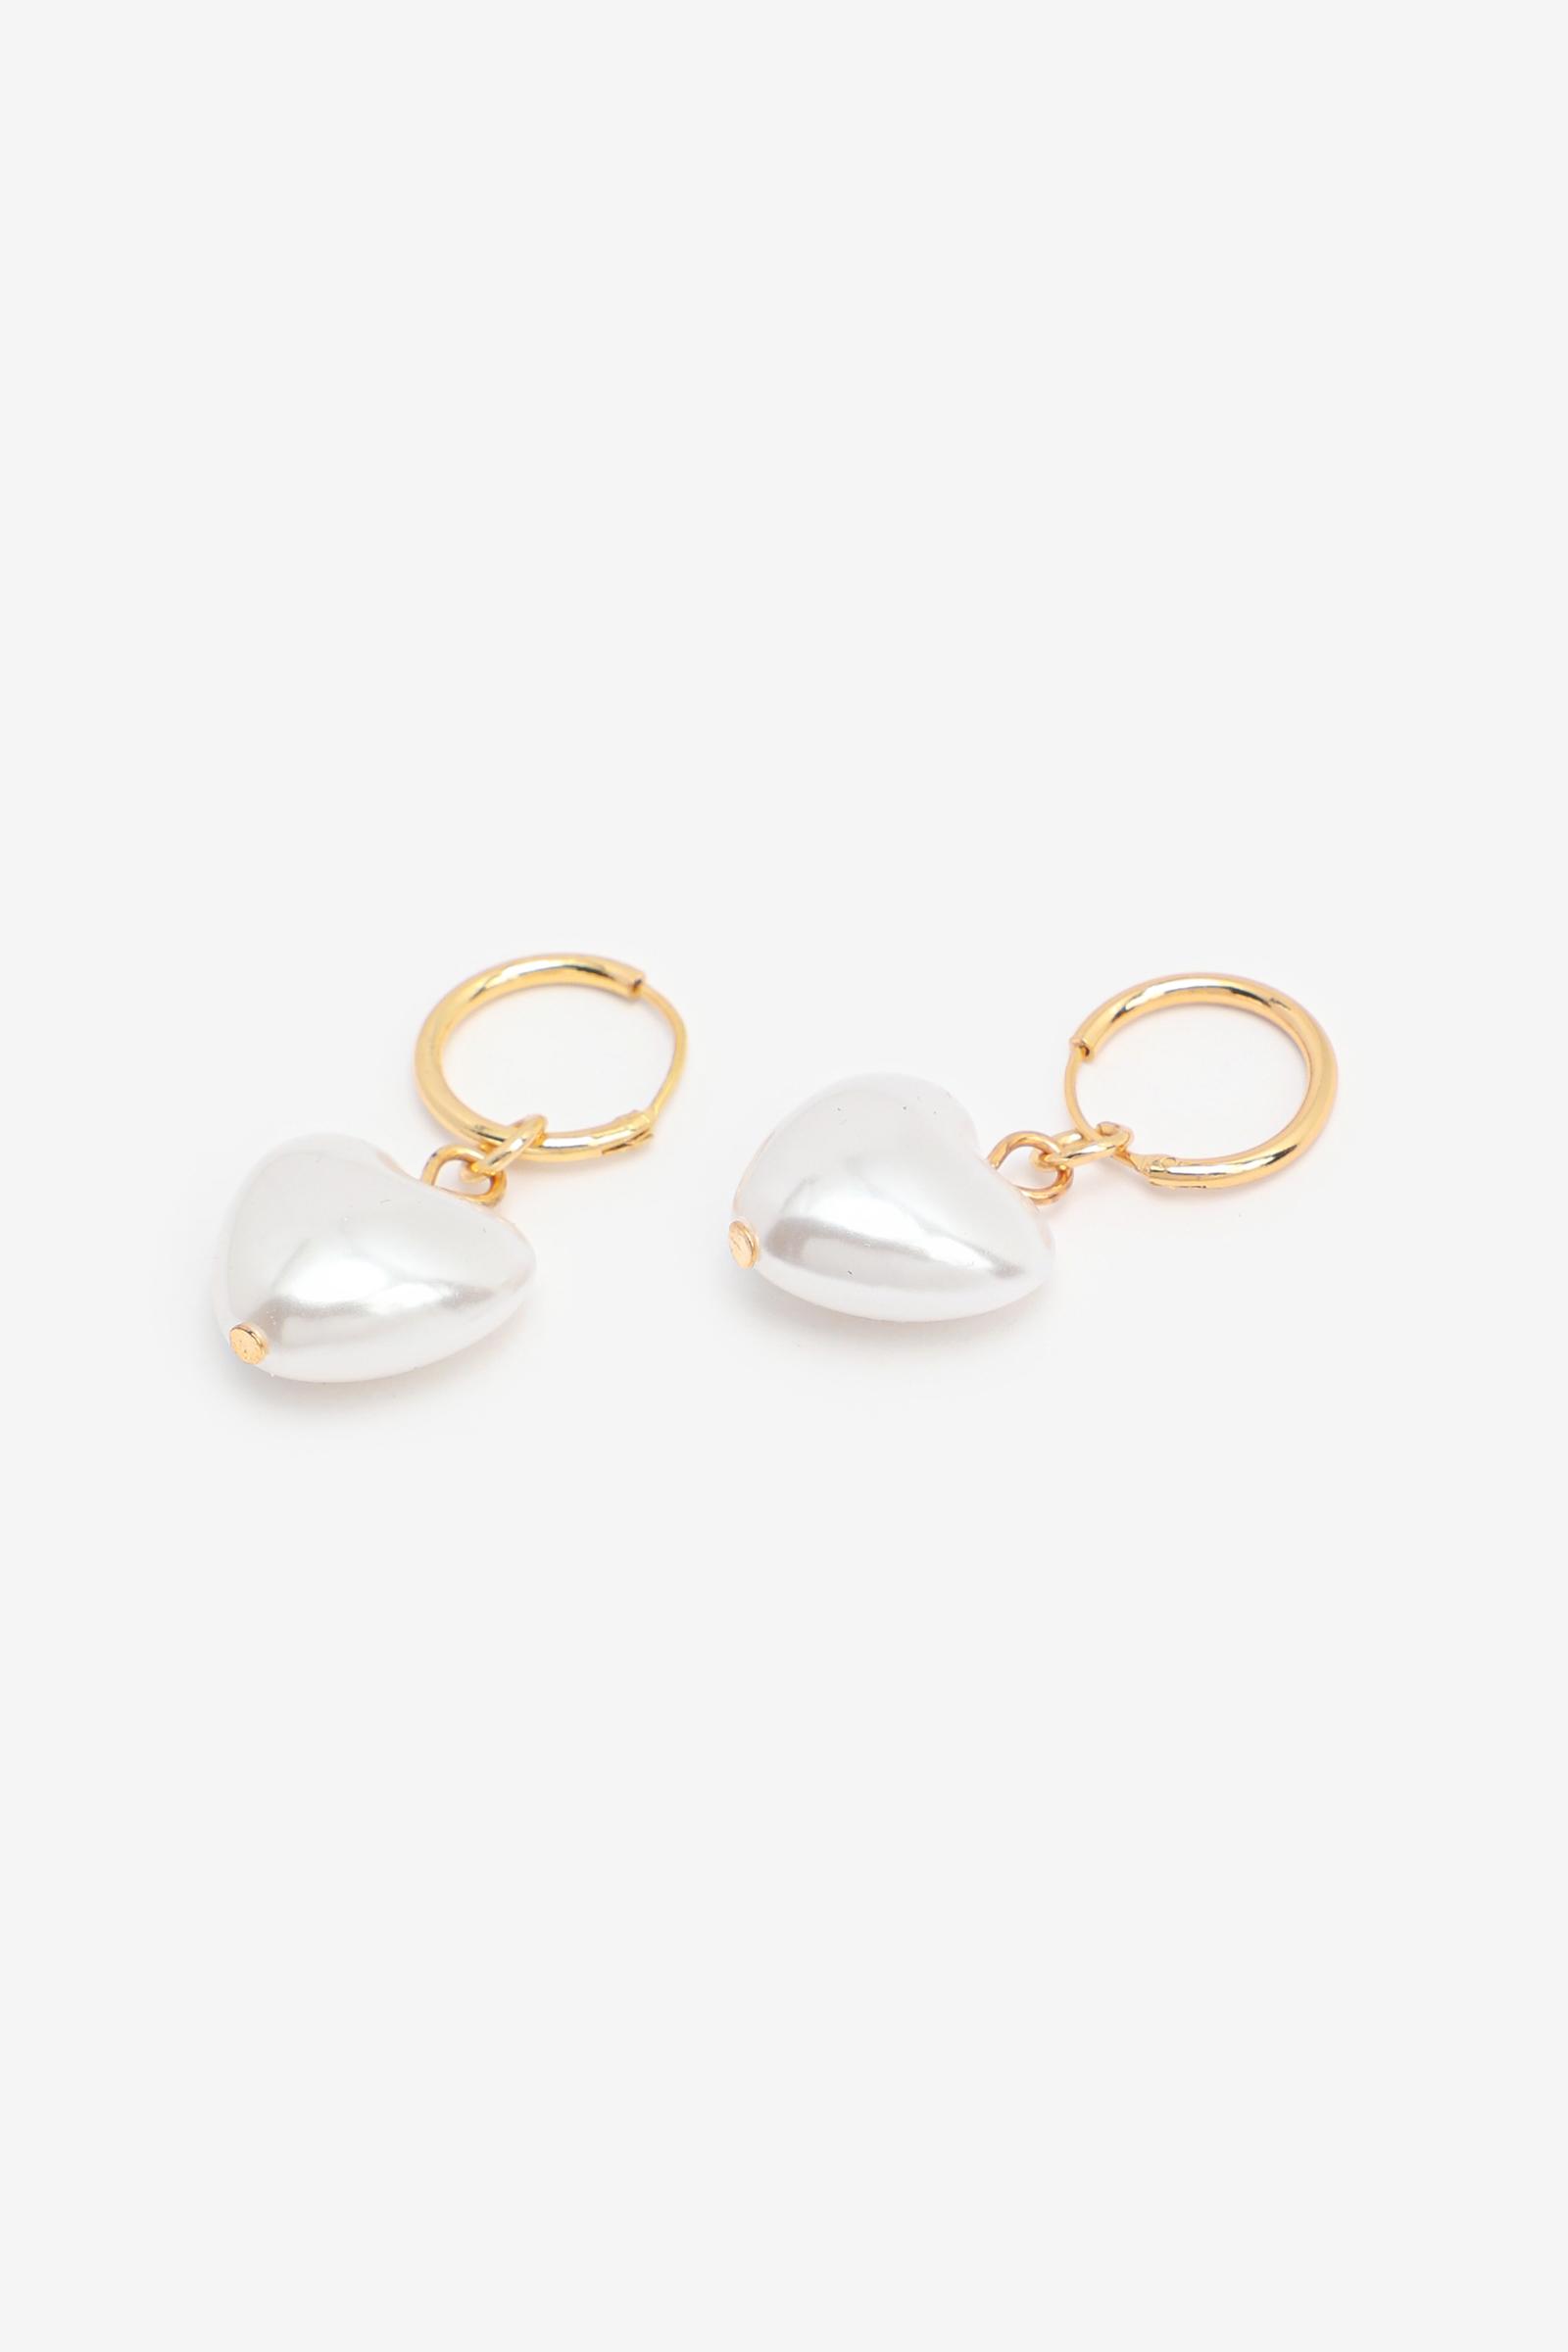 Dangling Heart Hoop Earrings